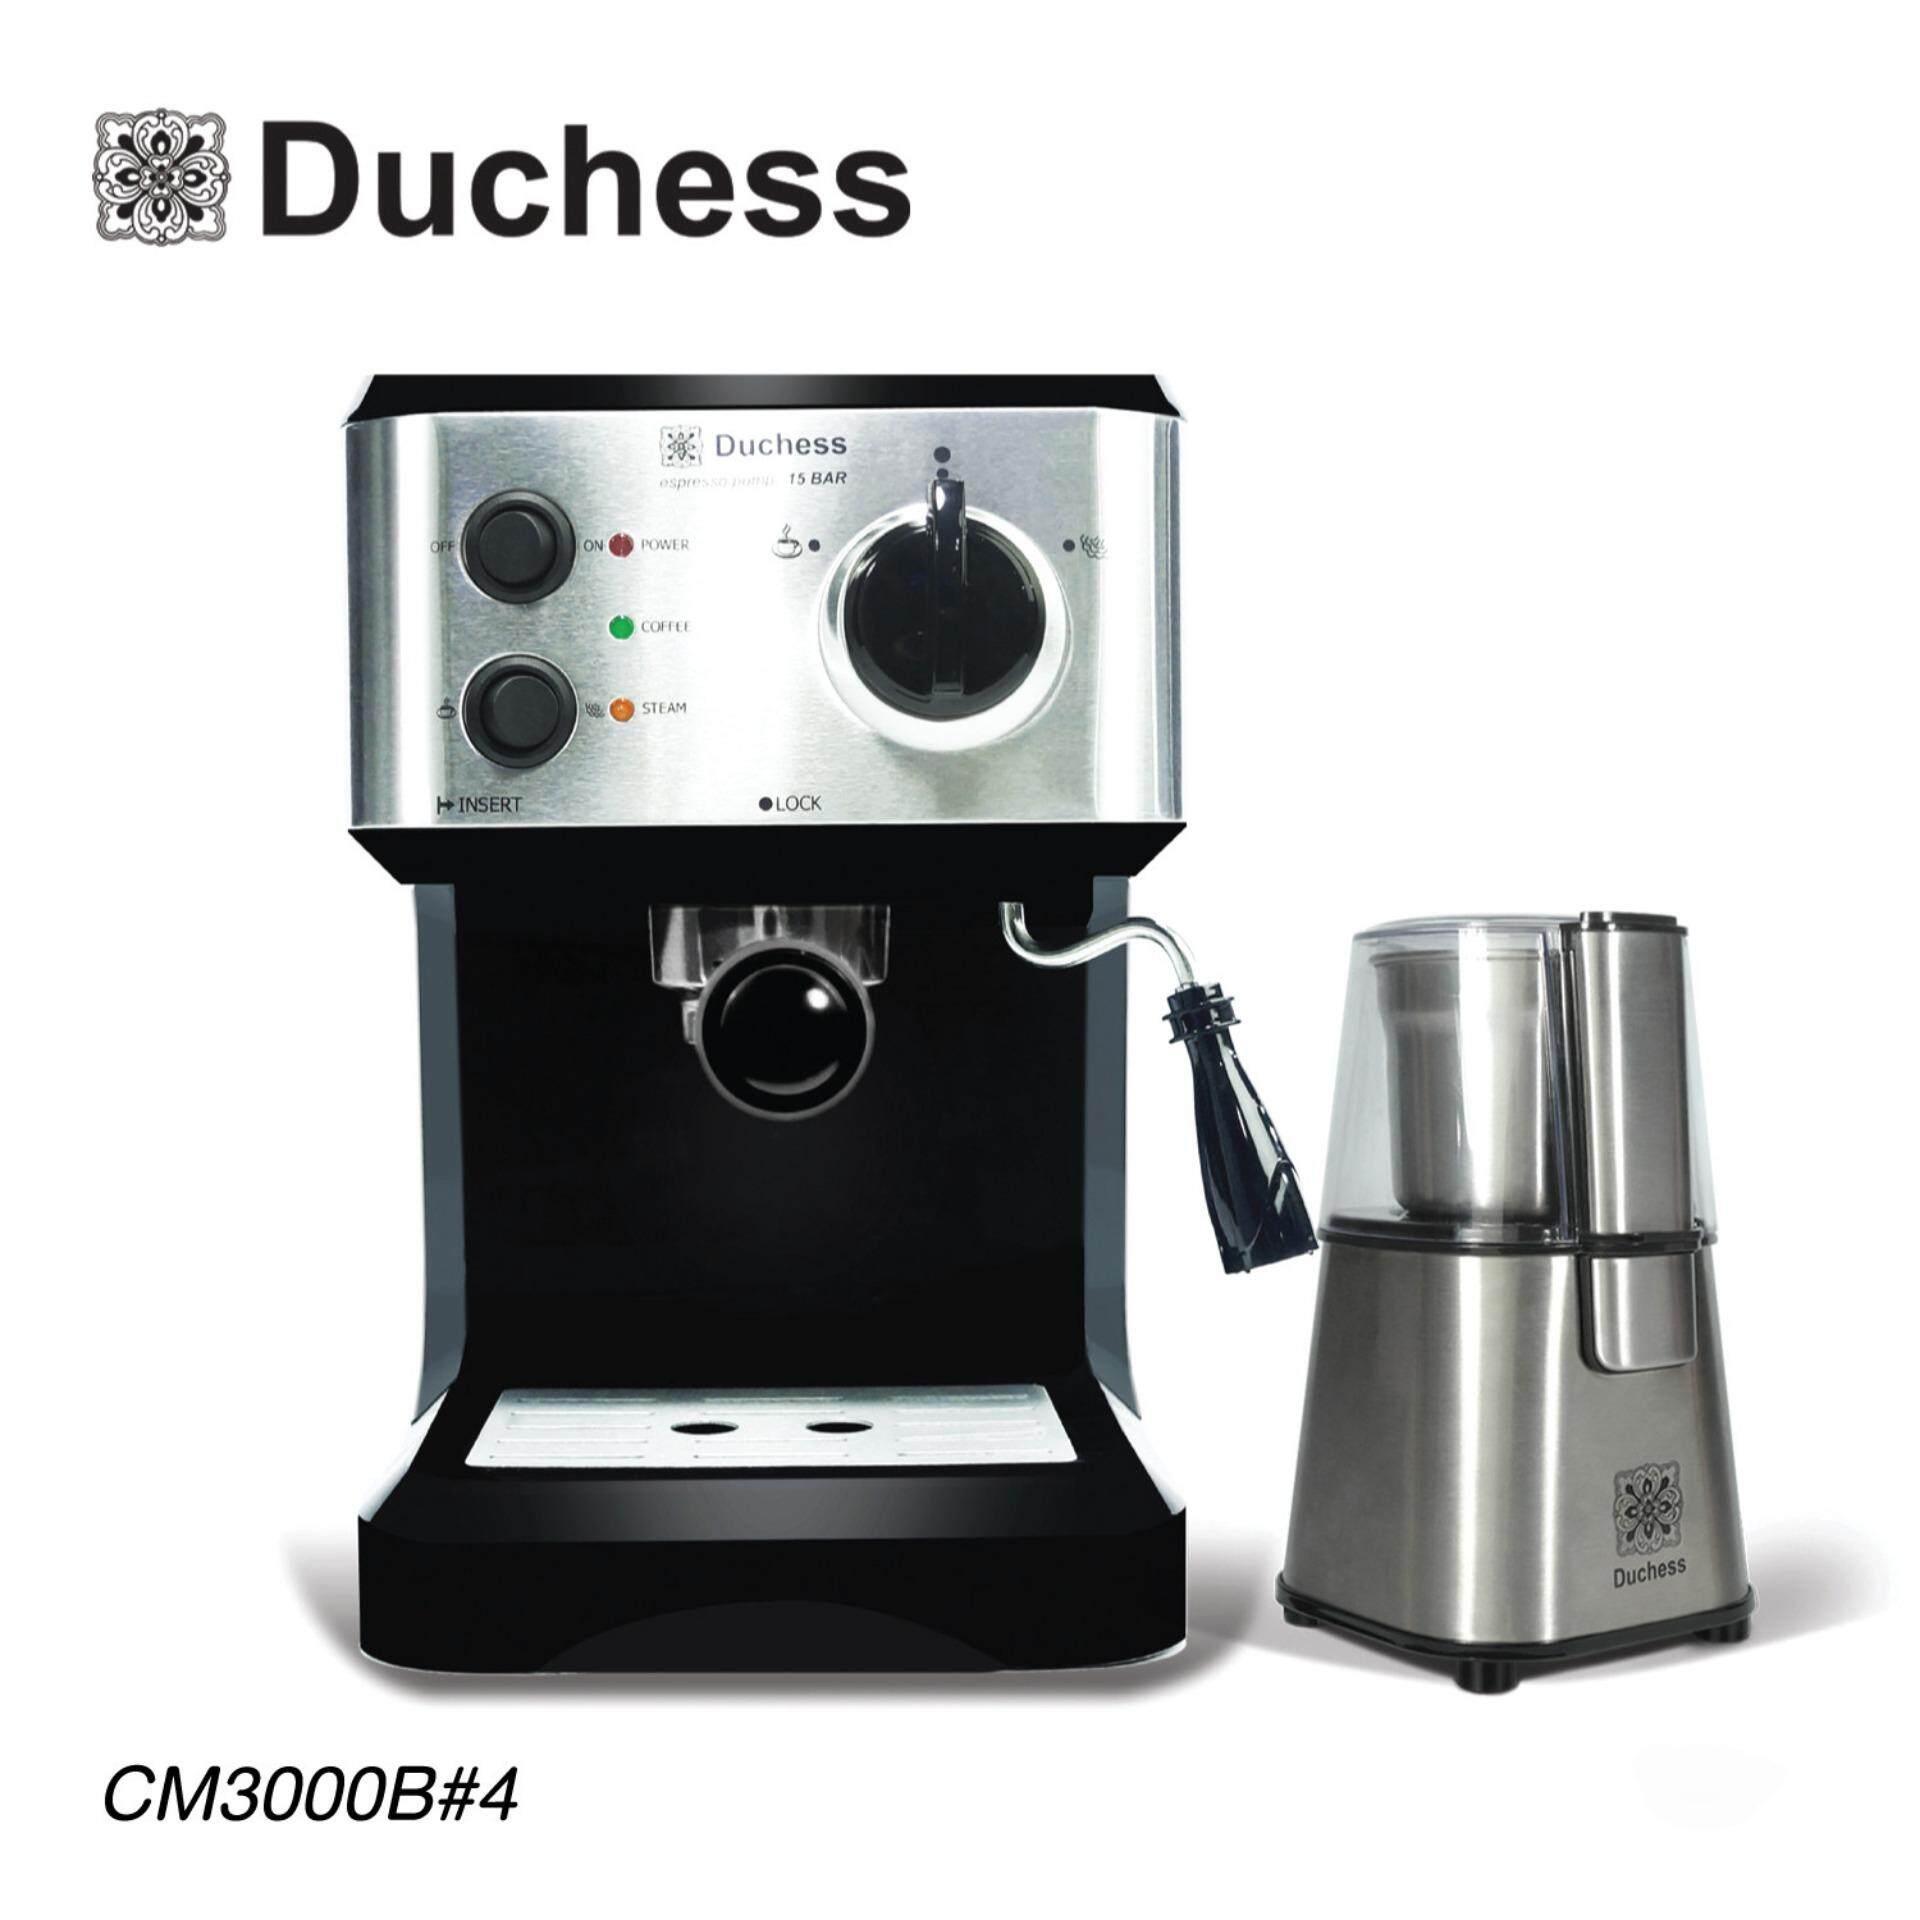 "Duchess CM3000B#4 - เครื่องชงกาแฟ CM3000B + เครื่องบดเมล็ดกาแฟ CG9100S  - 373fd5b6d9d5ba41e1ab294f788a1cc8 - วิธีล้างหัวชงกาแฟด้วย ""UMI"" แบบใช้ BLIND RUBBER FILTER"